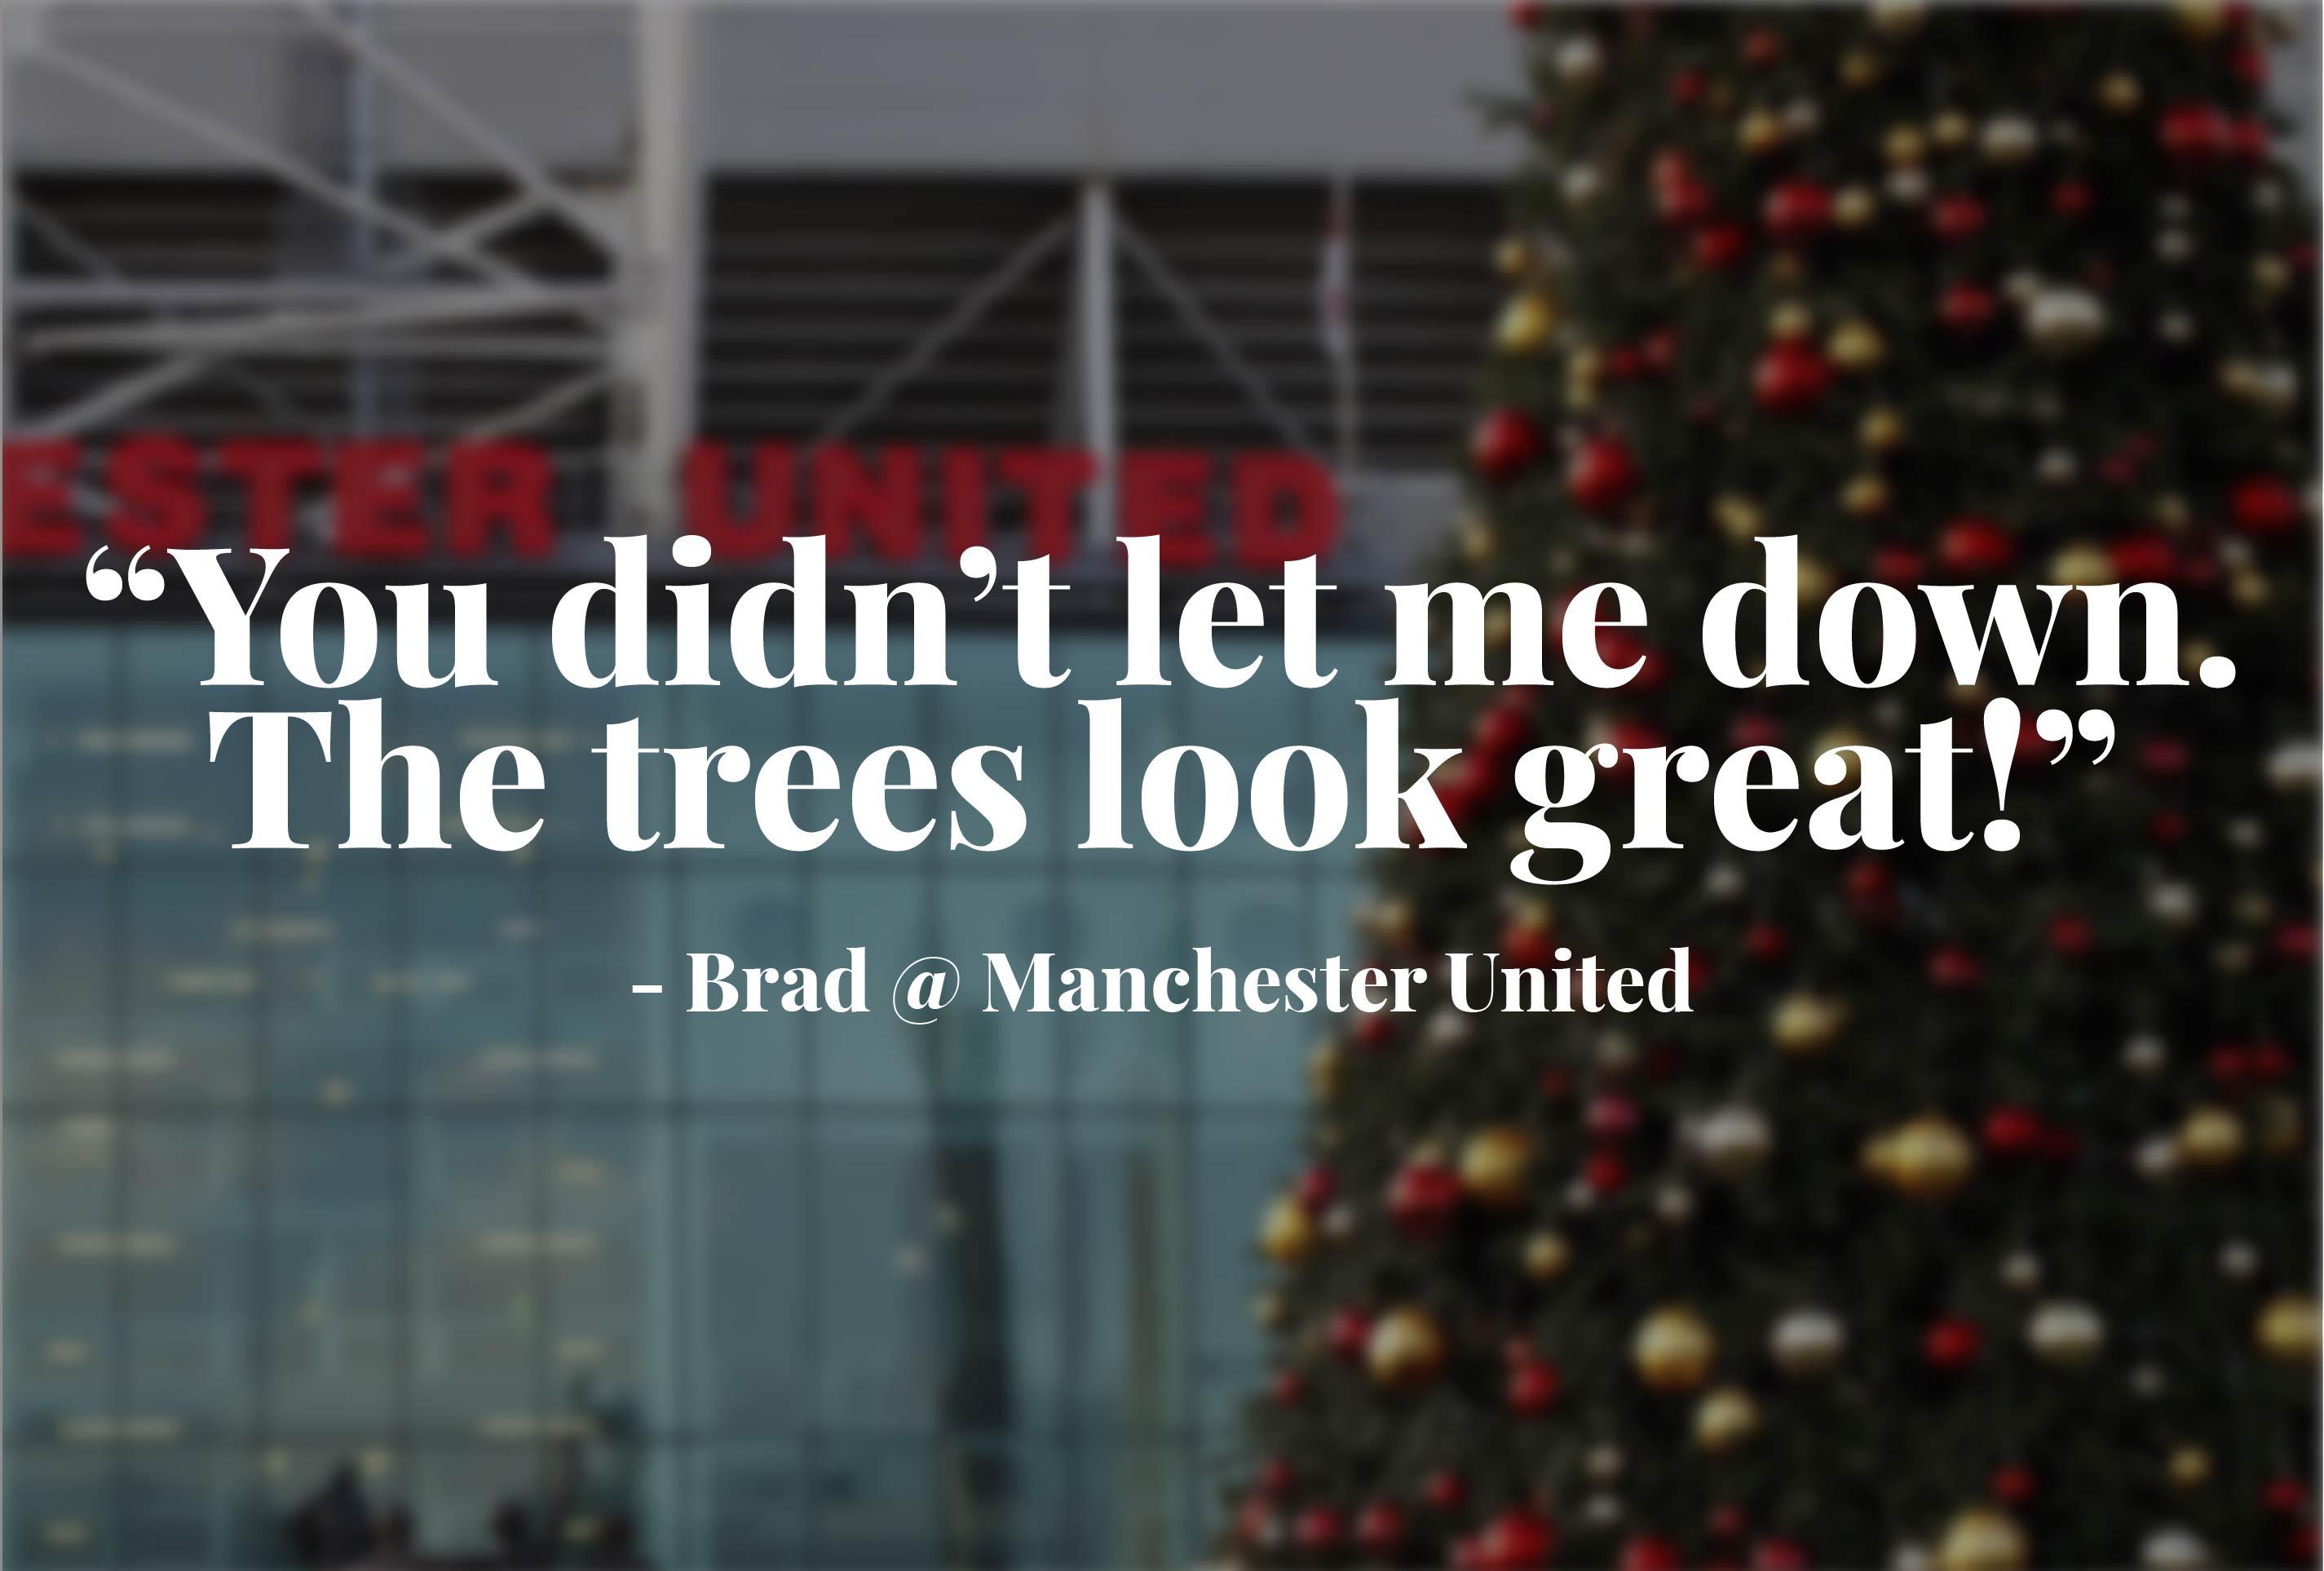 Brad Manchester United